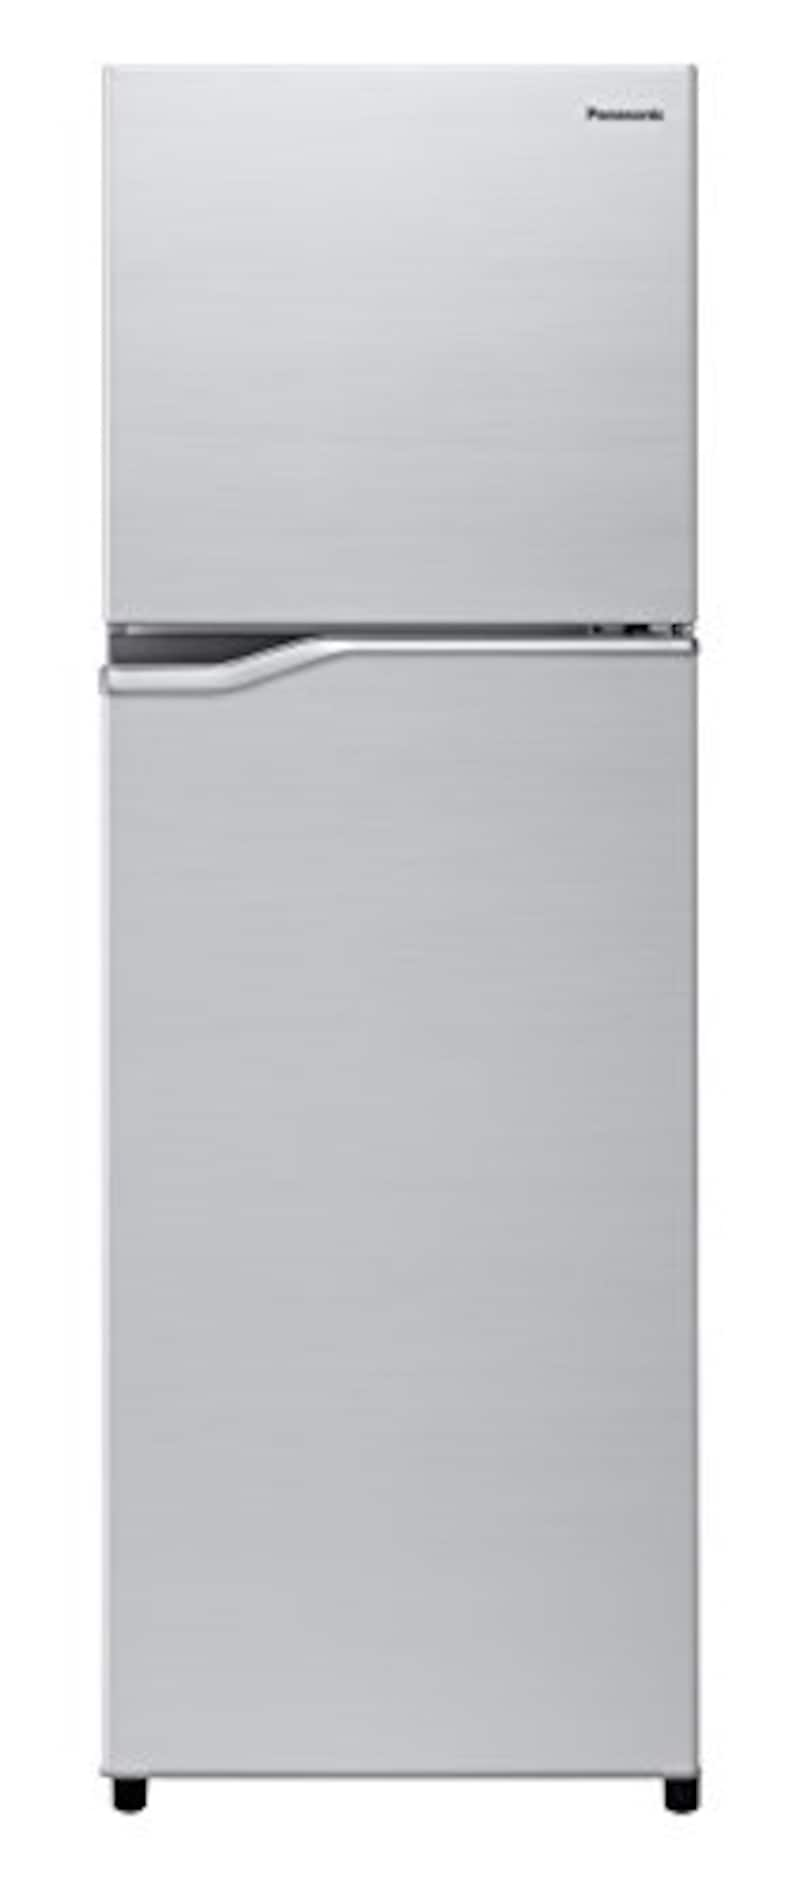 Panasonic(パナソニック),2ドア冷蔵庫 シャイニーシルバー,NR-B250T-SS